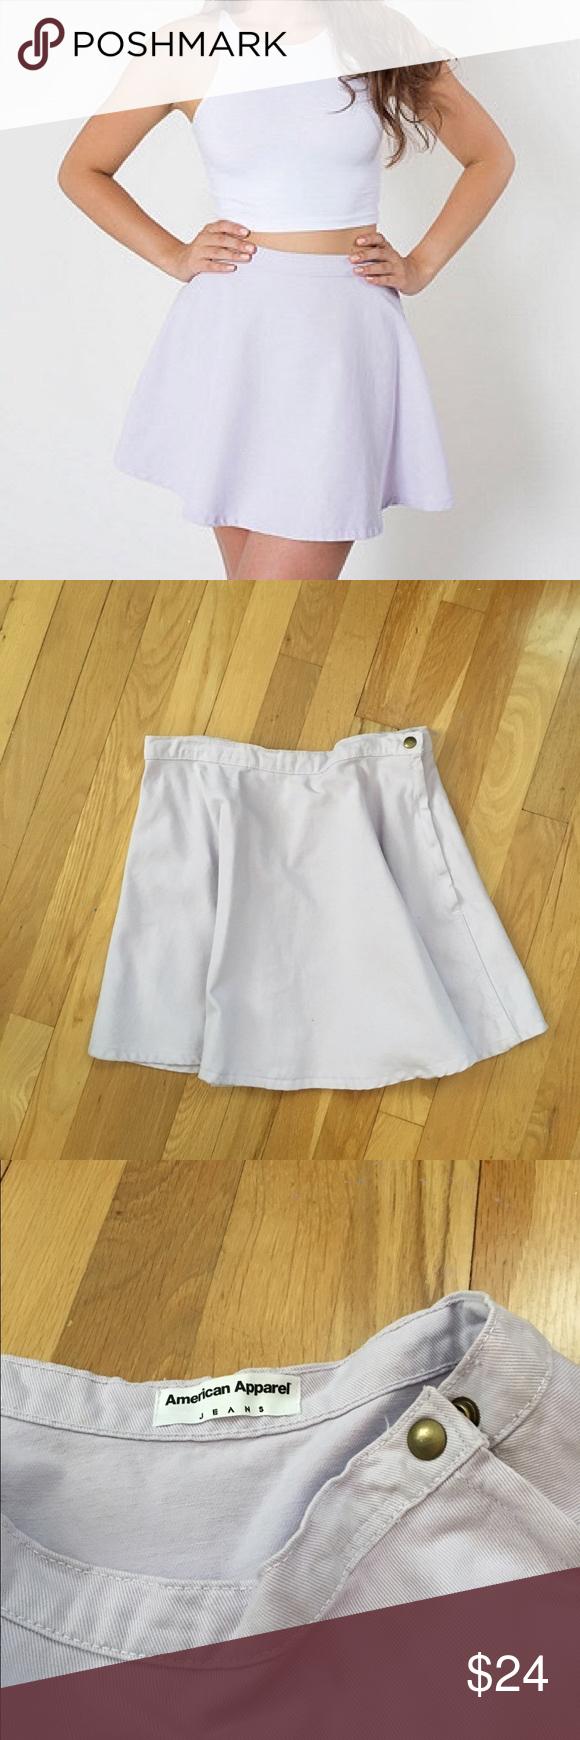 American apparel Lilac denim circle skirt Perfect condition, NWT American Apparel Skirts Circle & Skater